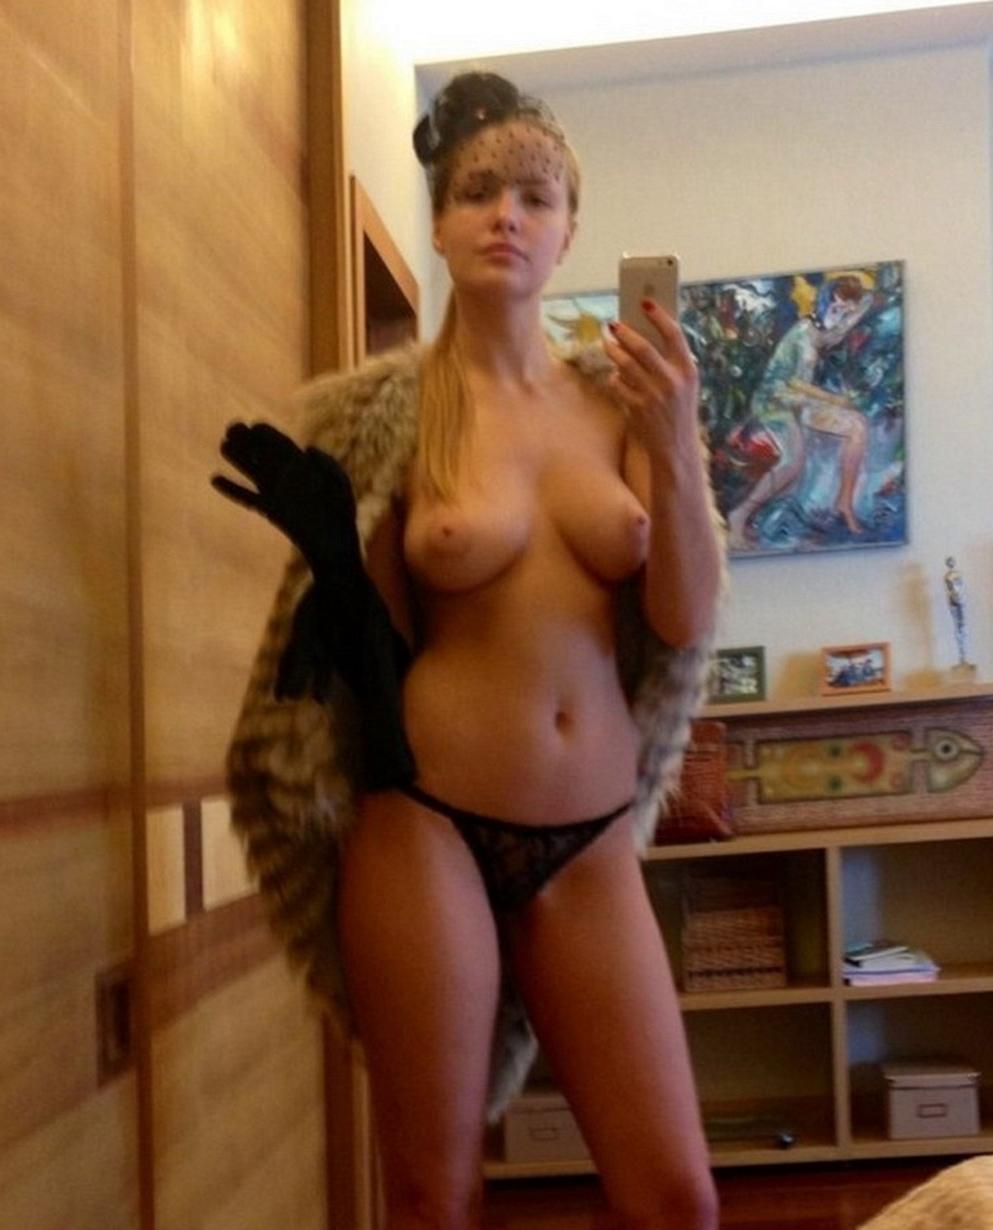 SNSに自撮りうpするロシアの妖精たちのエロ画像がヤバい・・・(34枚)・22枚目